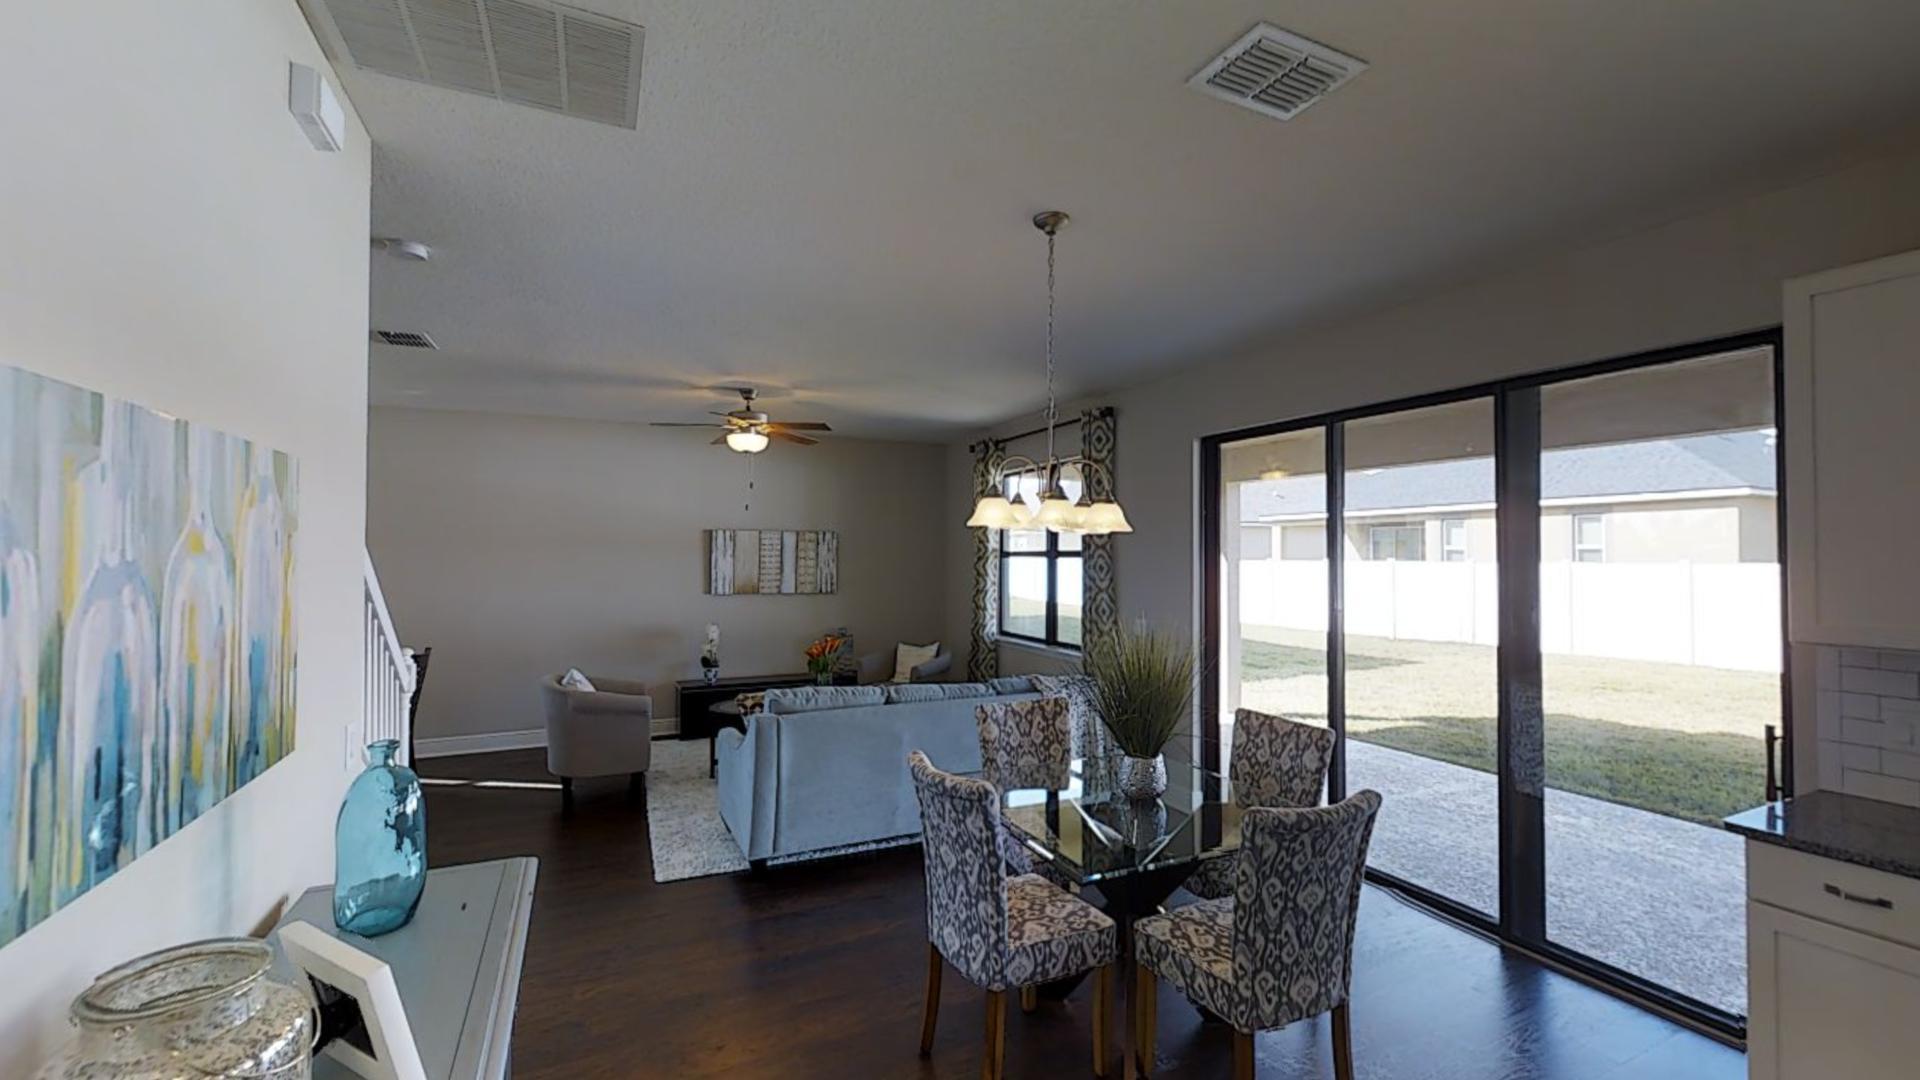 Florida Homes And Kitchen Llc